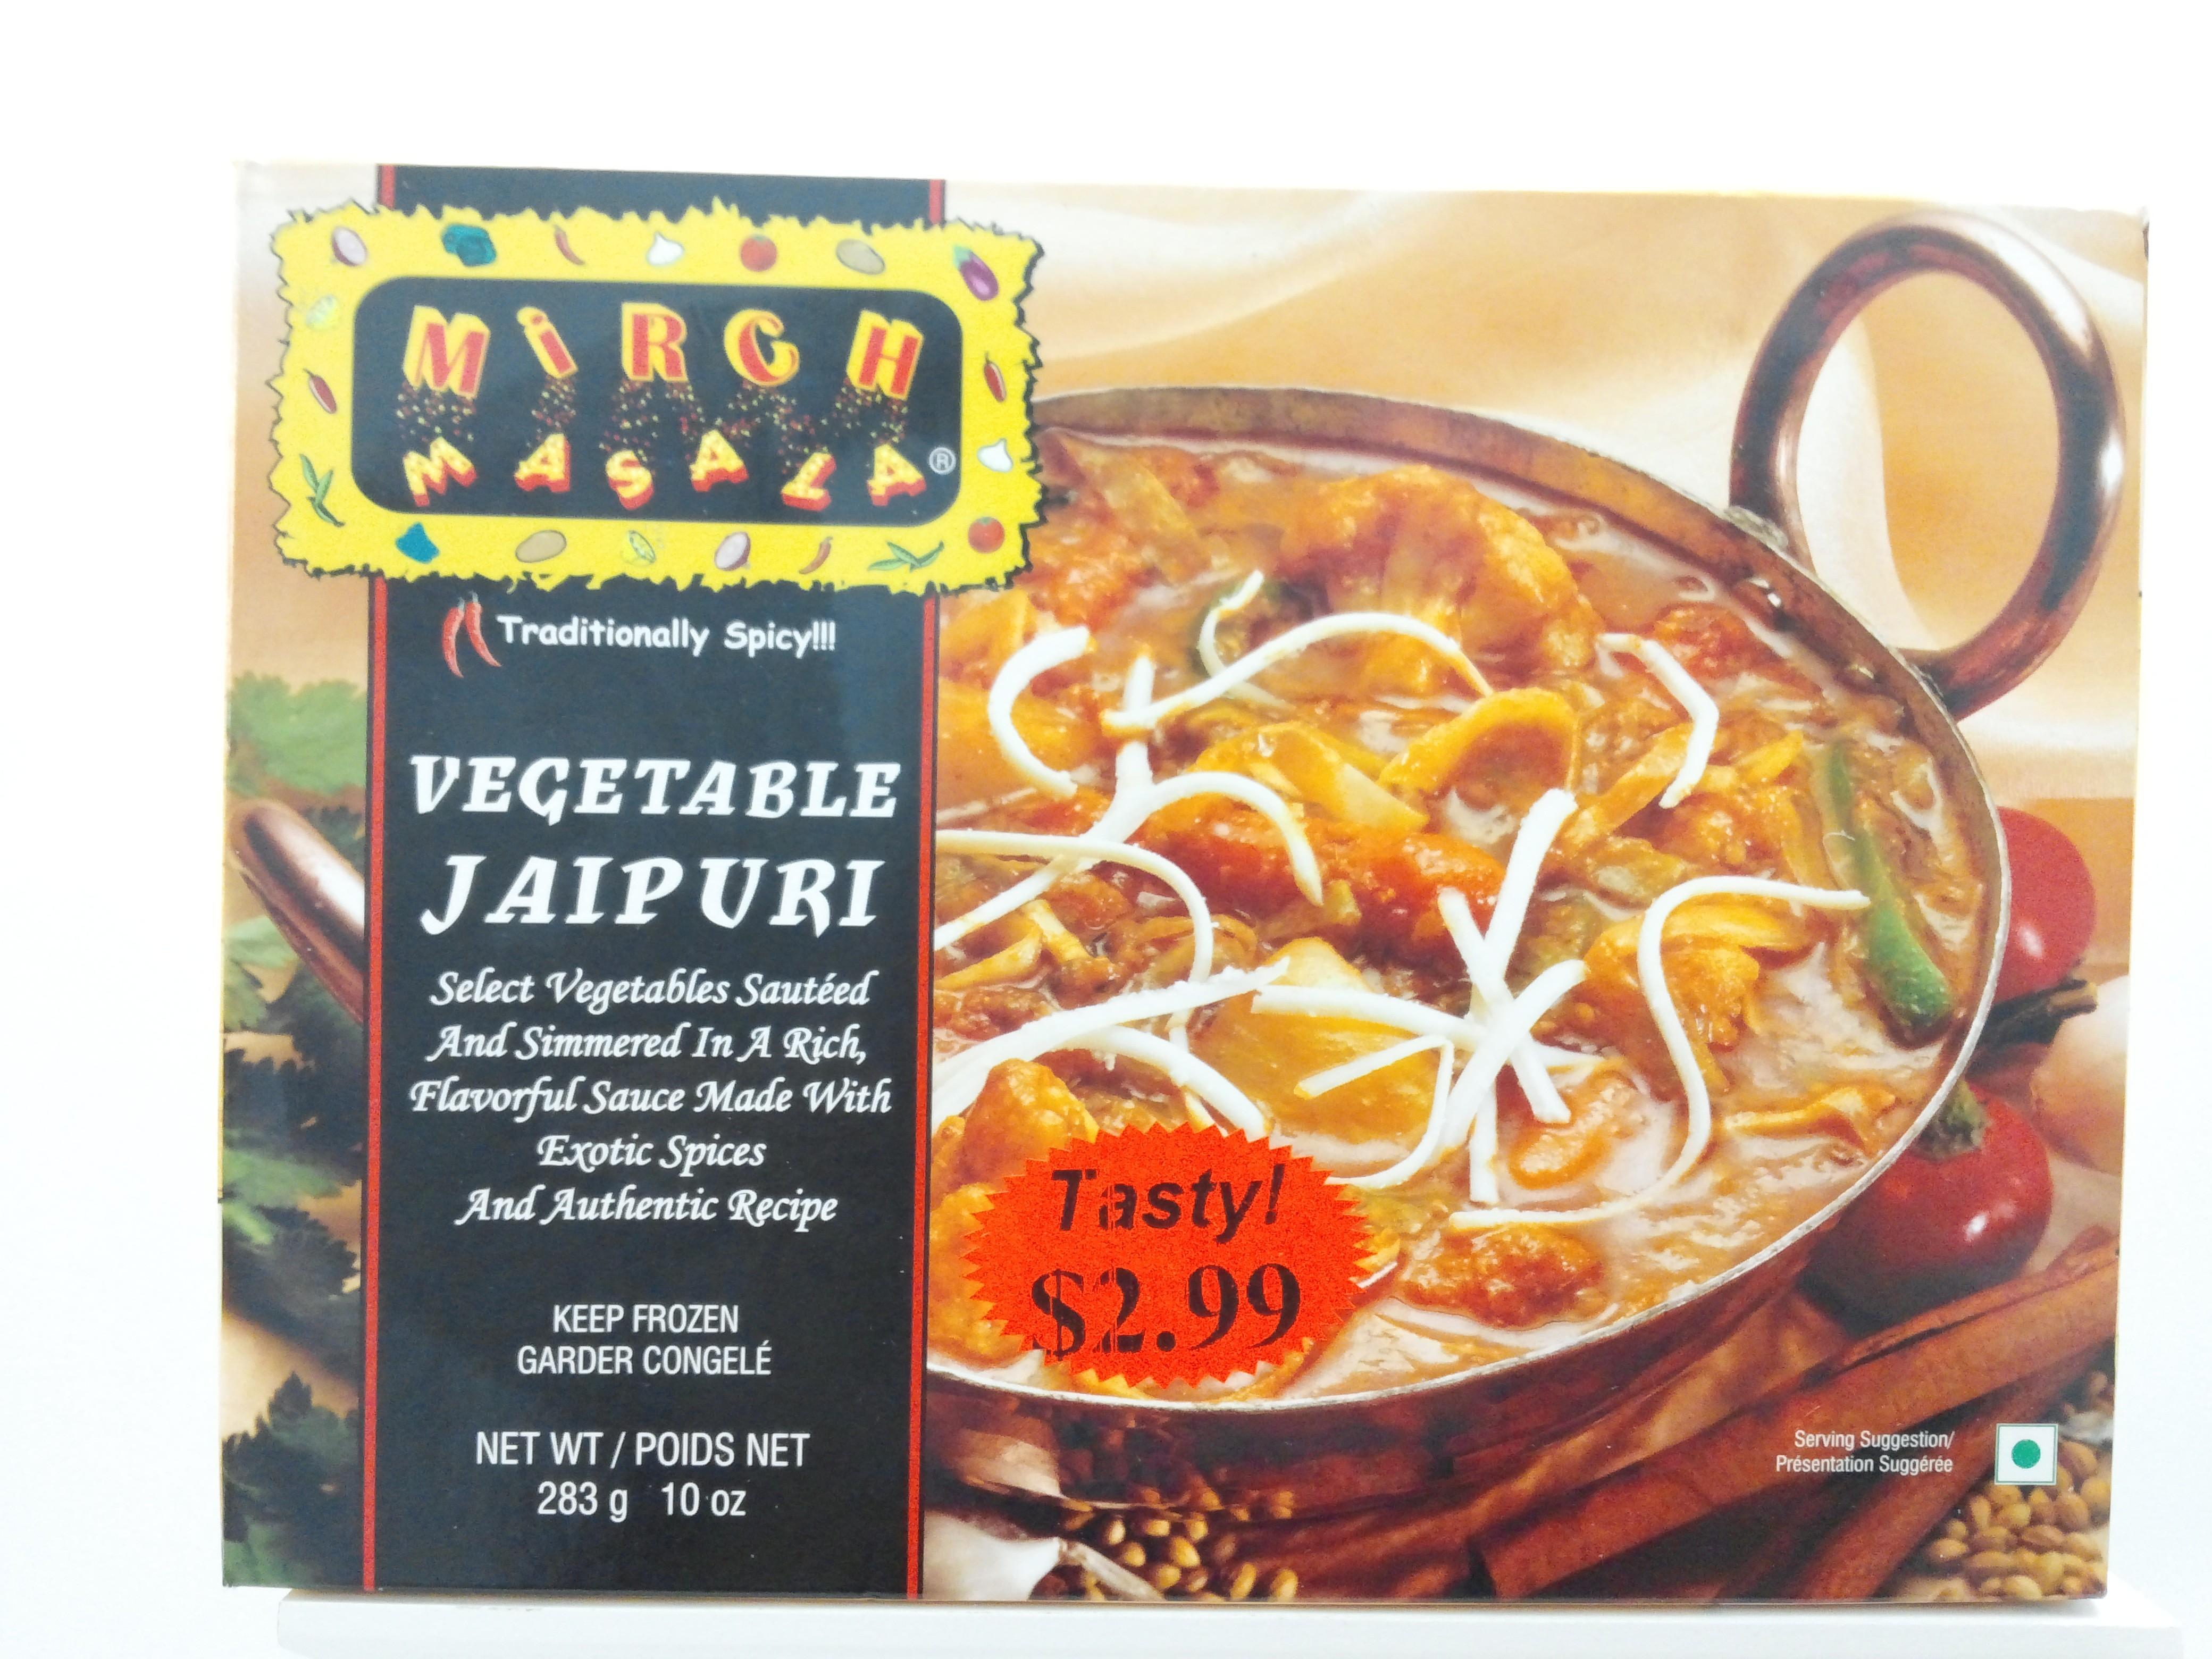 Mirch Masala Vegetable Jaipuri 10 oz